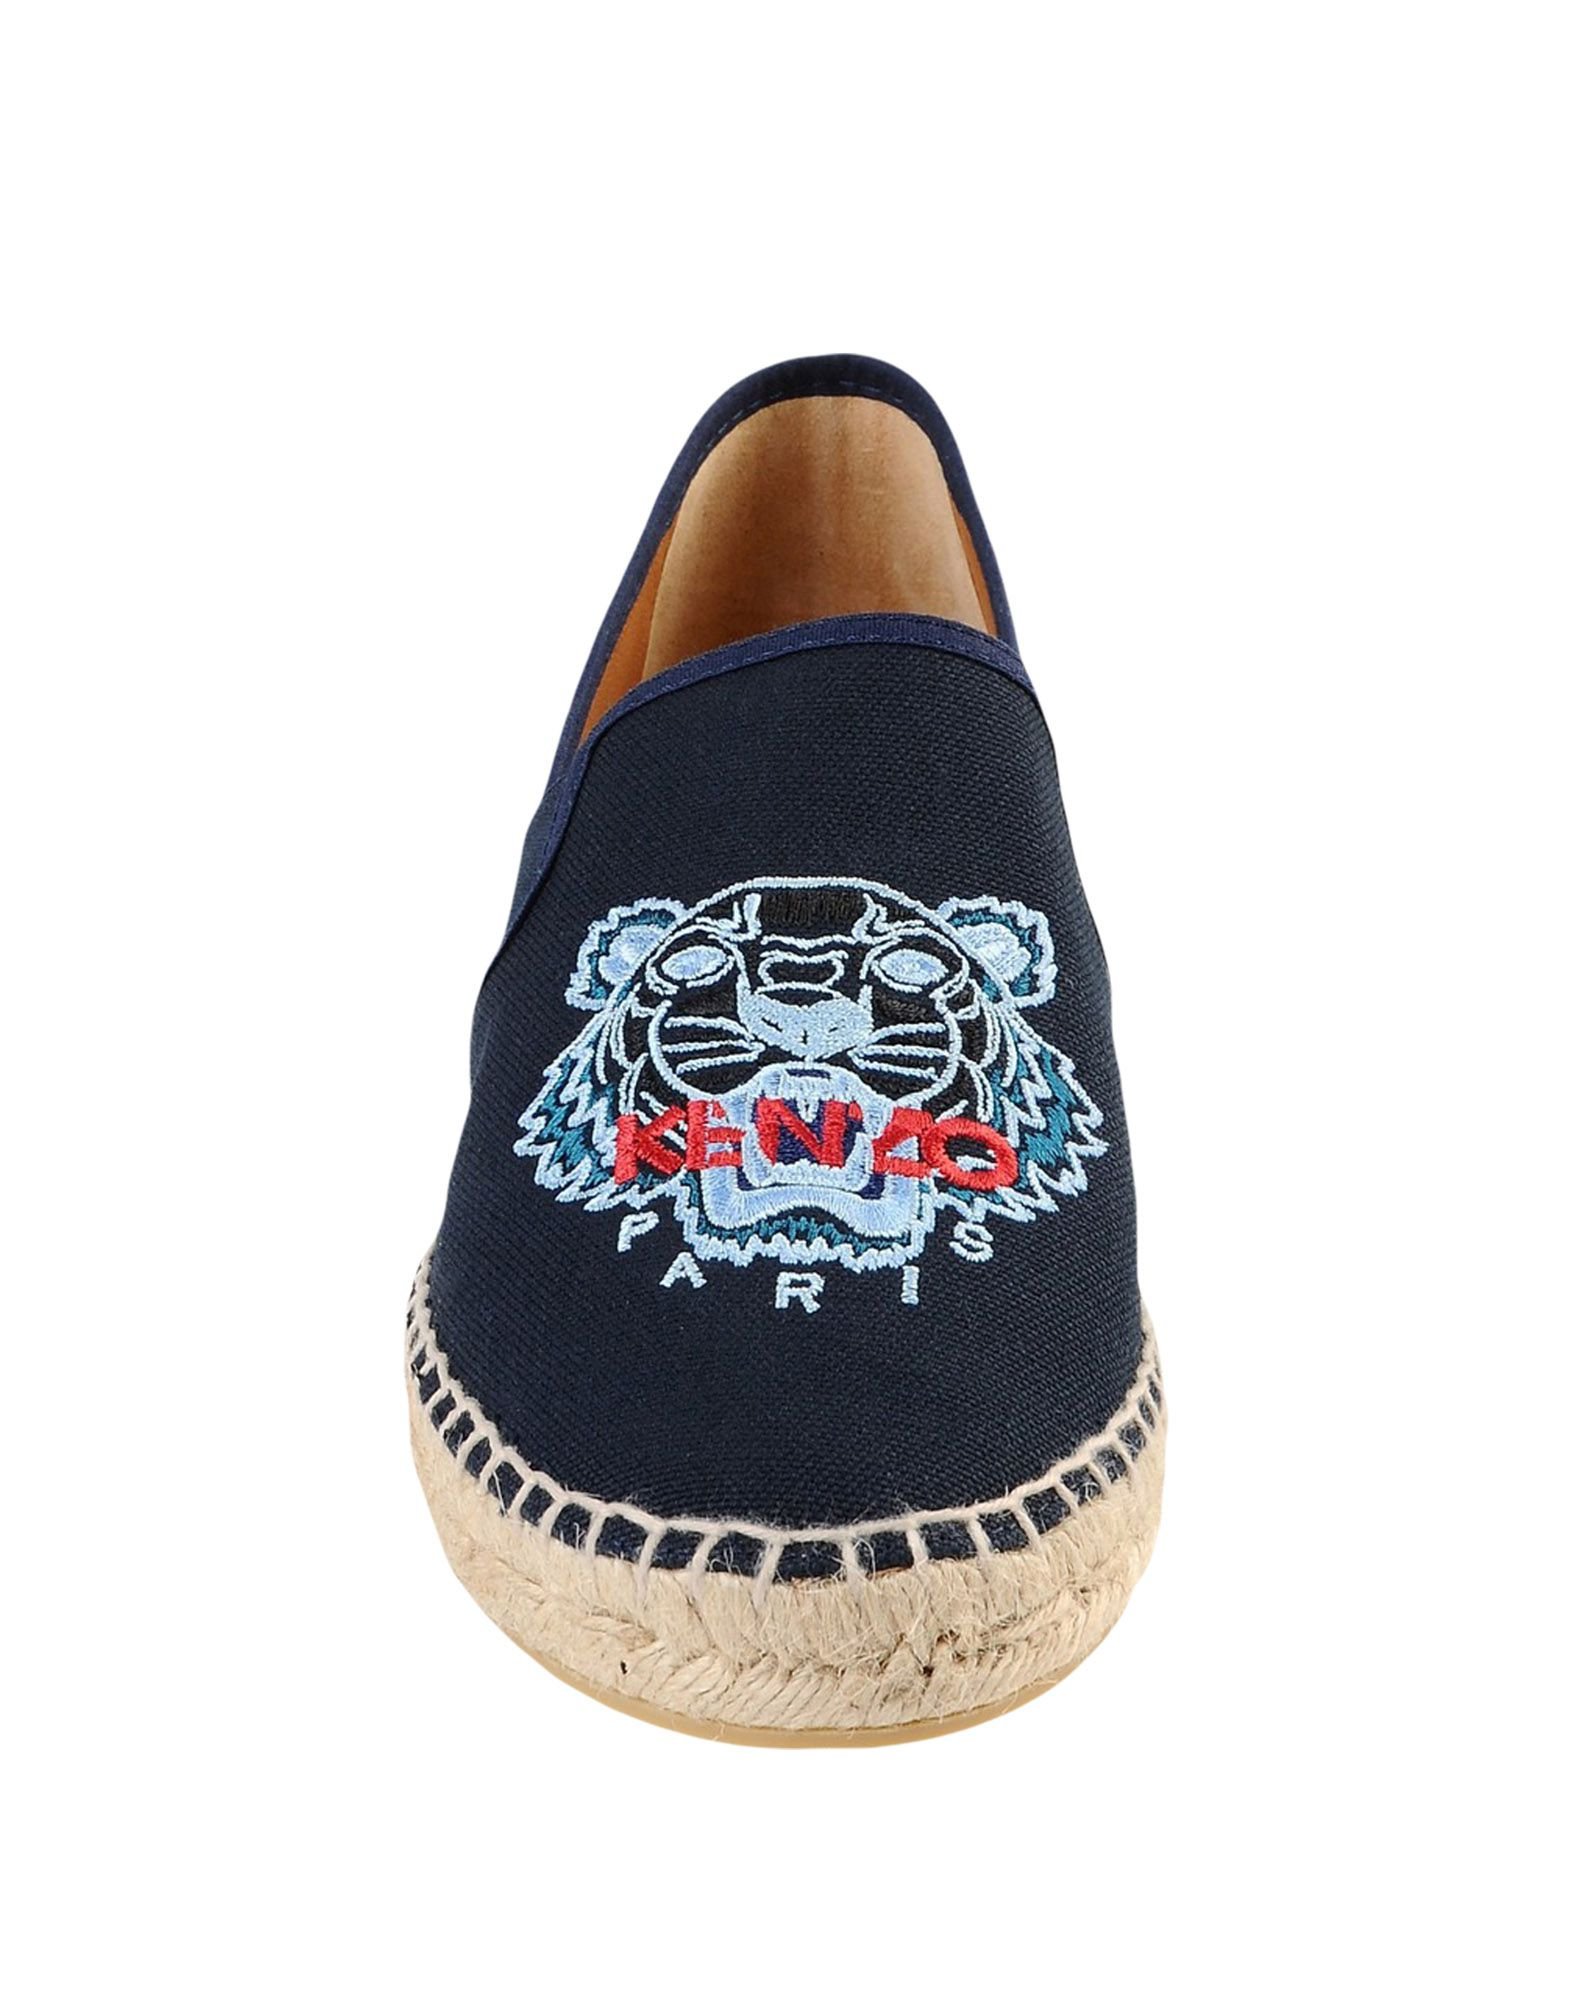 Kenzo Espadrilles Damen  11545166UPGut aussehende strapazierfähige Schuhe Schuhe Schuhe 034f5c